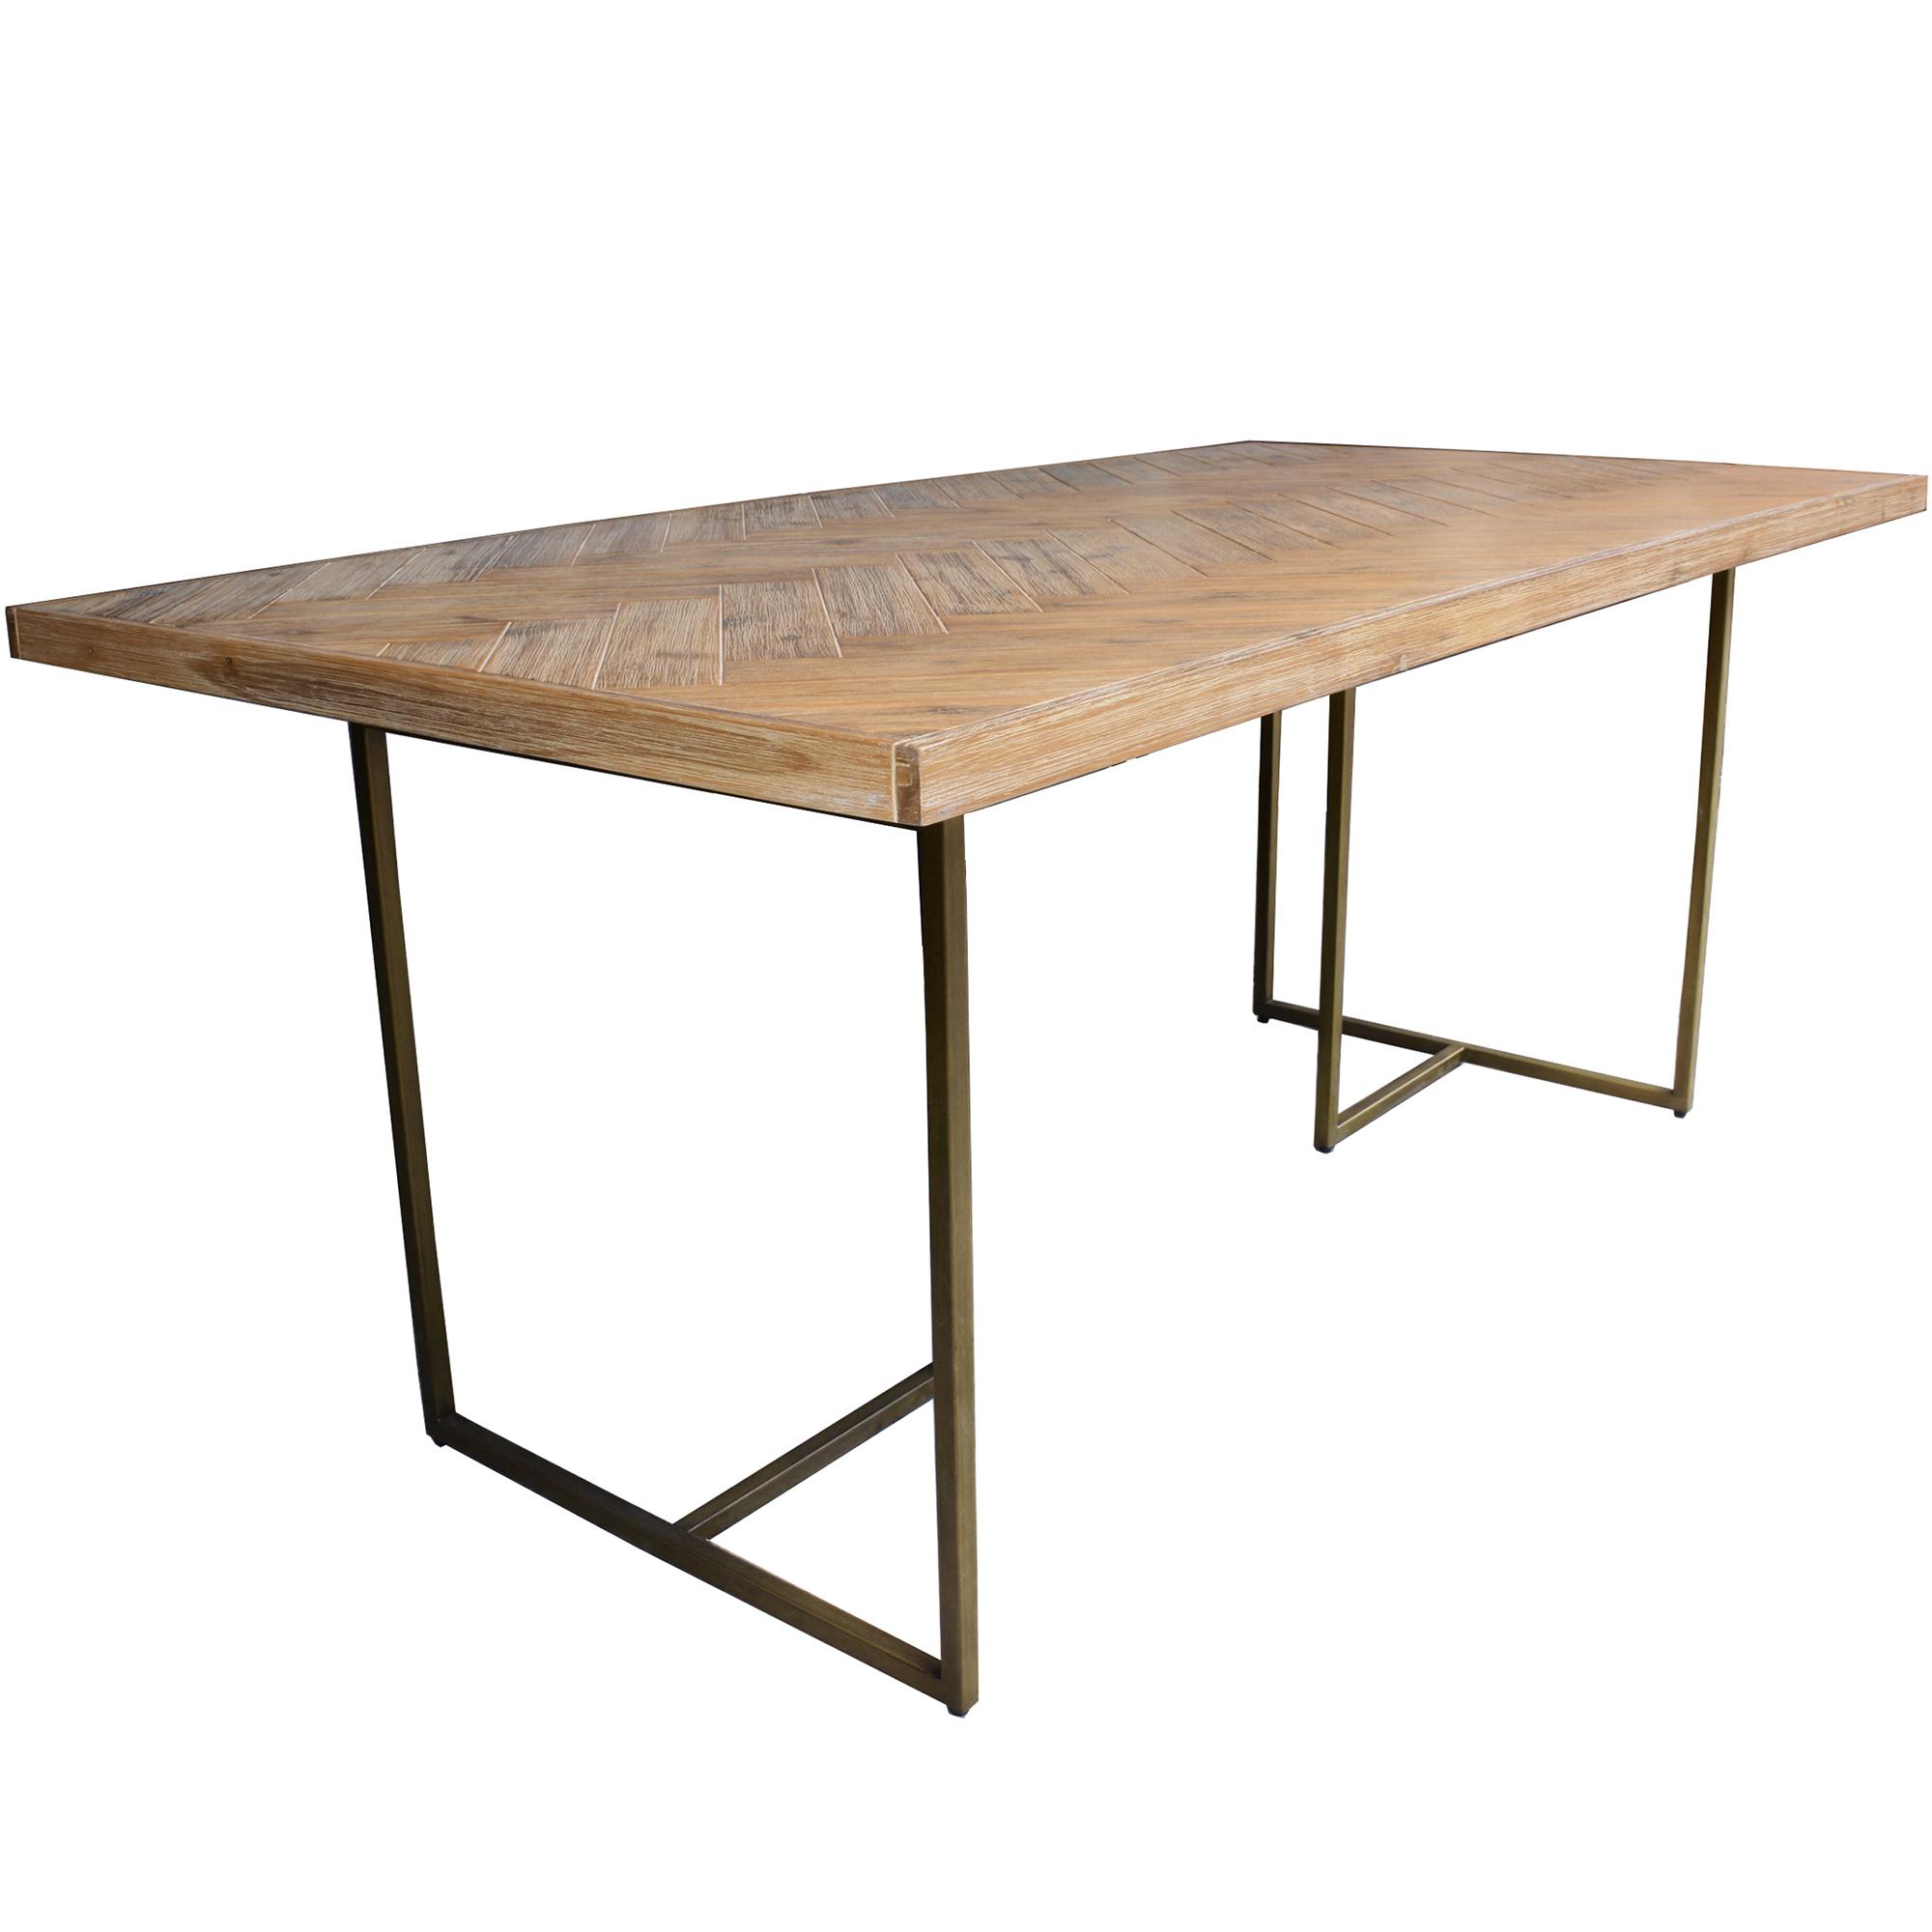 Sku dodi2772 malibu oak dining table is also sometimes listed under the following manufacturer numbers v rom 01 oak v rom 10 oak